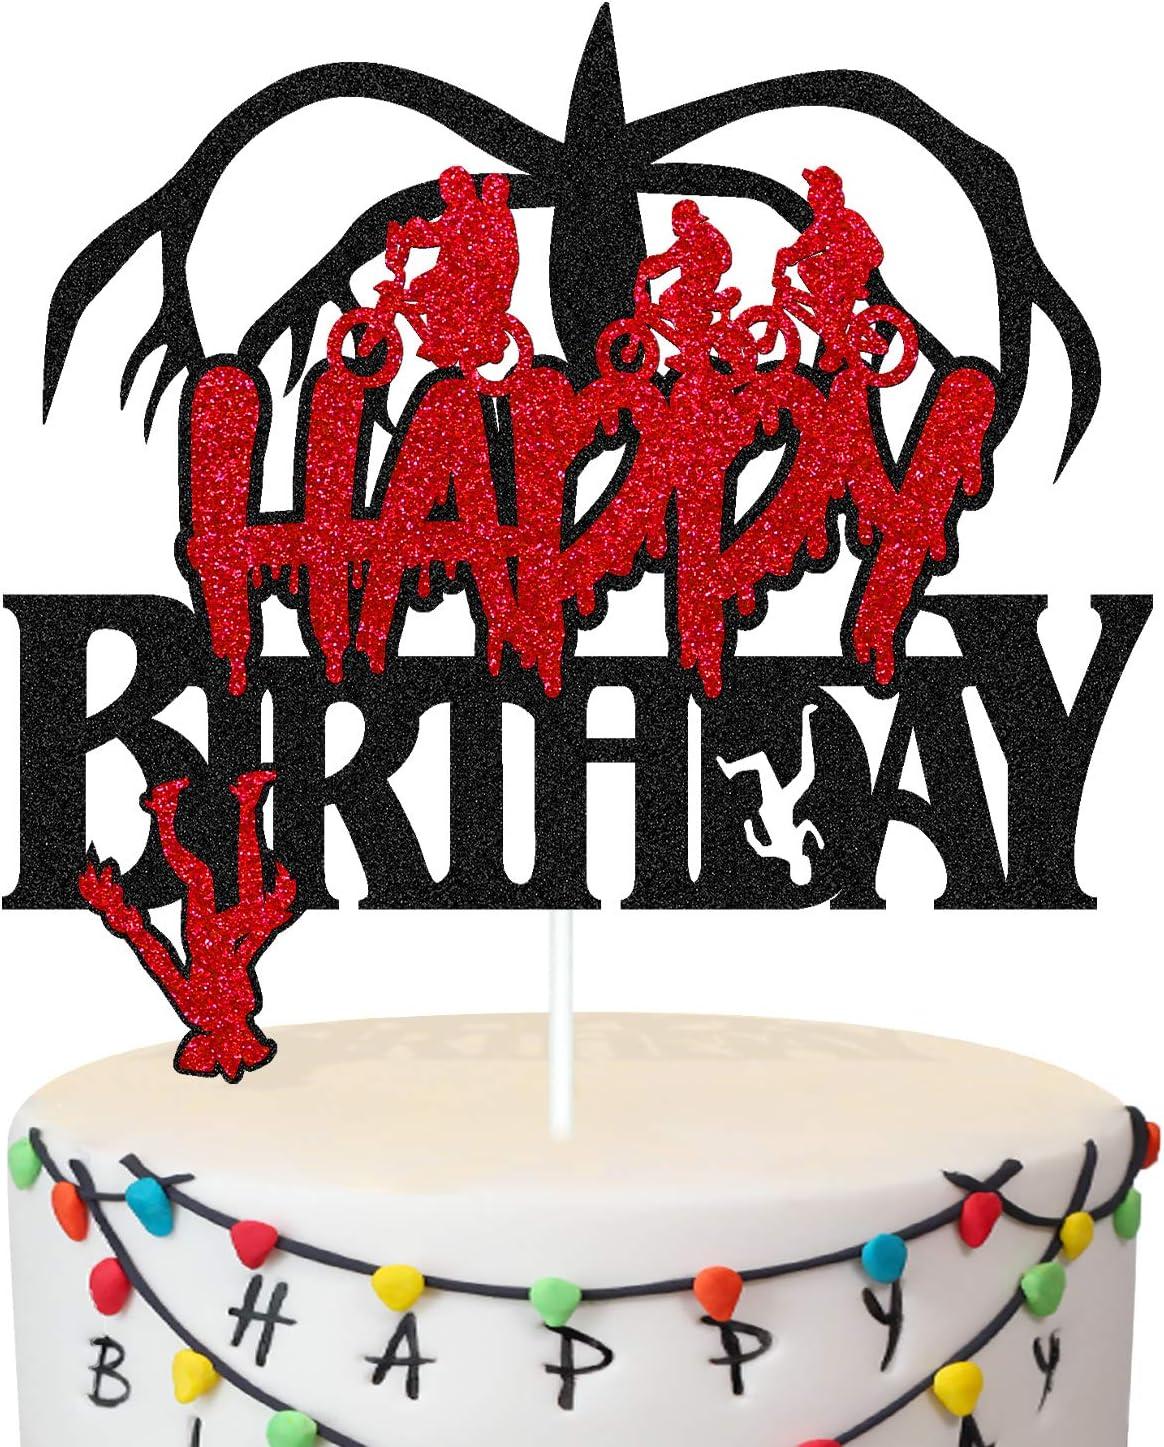 Stranger-Things Birthday Cake Topper Man Kids Boy Girl Happy Birthday Cake Décor for Cartoon Themed Birthday Party Supplies Black Glitter Decor